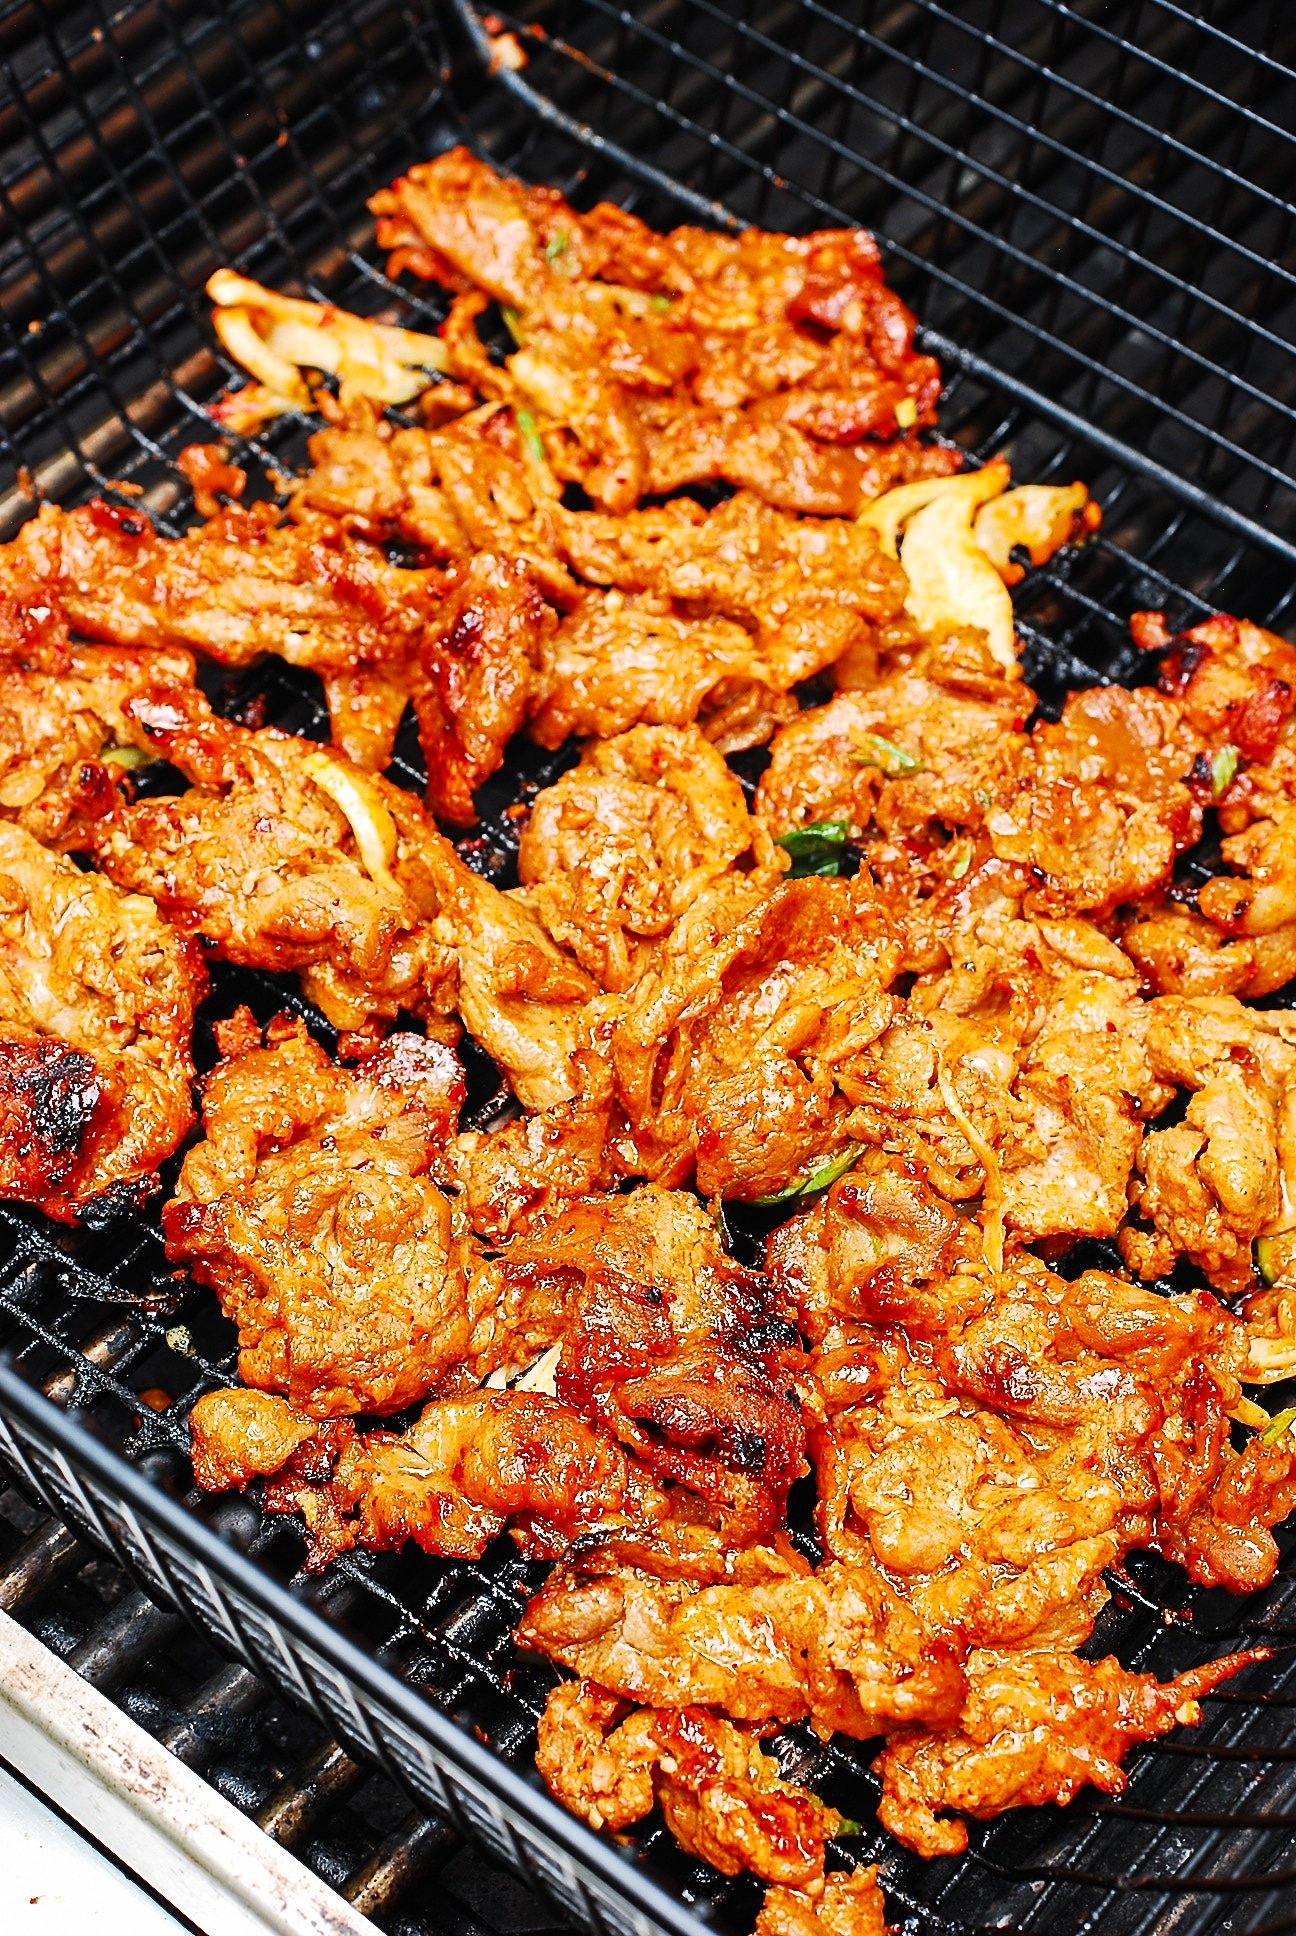 DSC 1855 2 1 - Jeyuk Bokkeum (Spicy Pork BBQ)